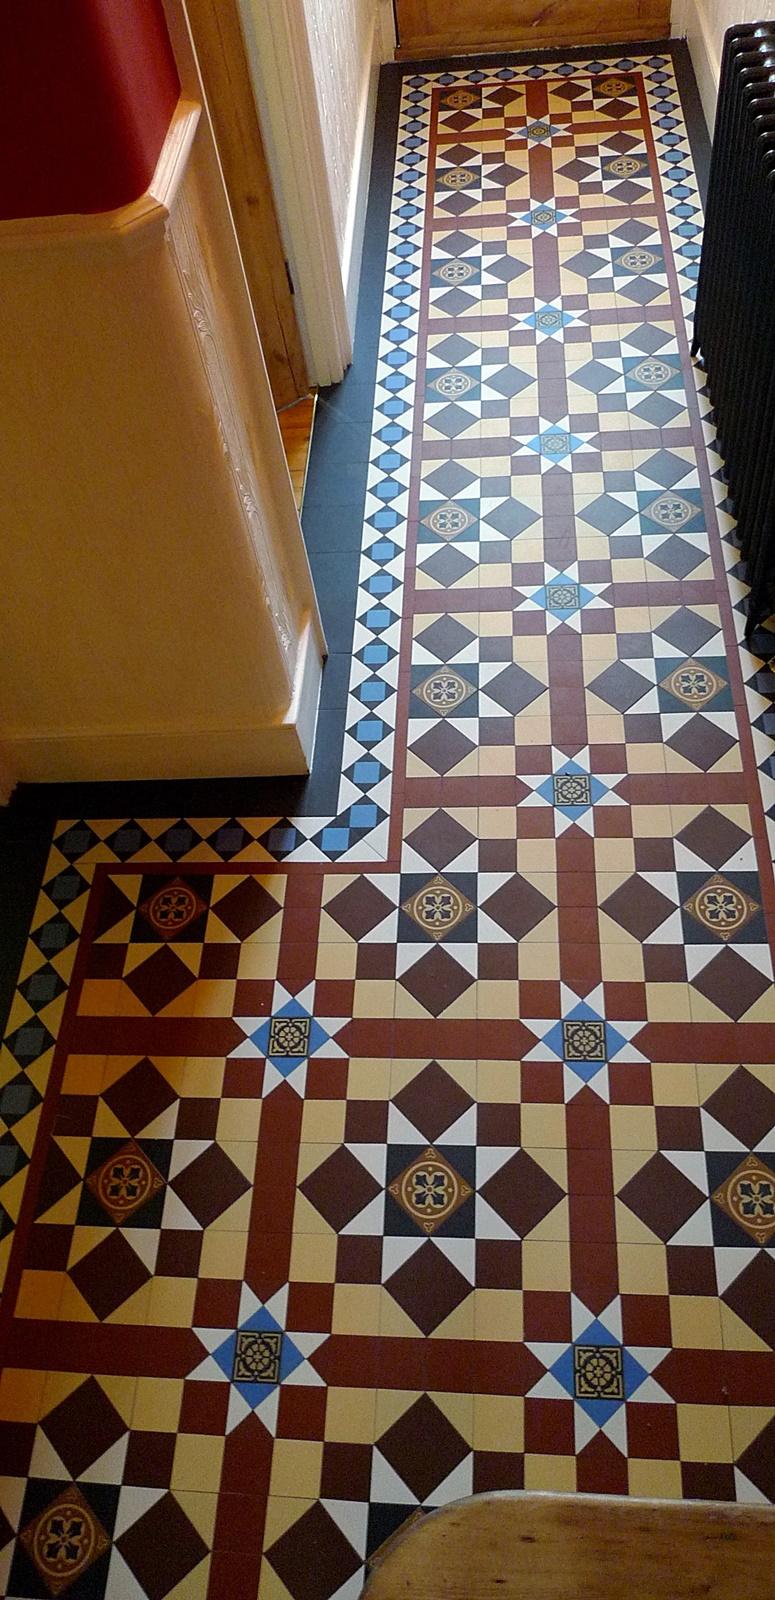 victorian mosaic tile hallway interanl house mosaic tile path